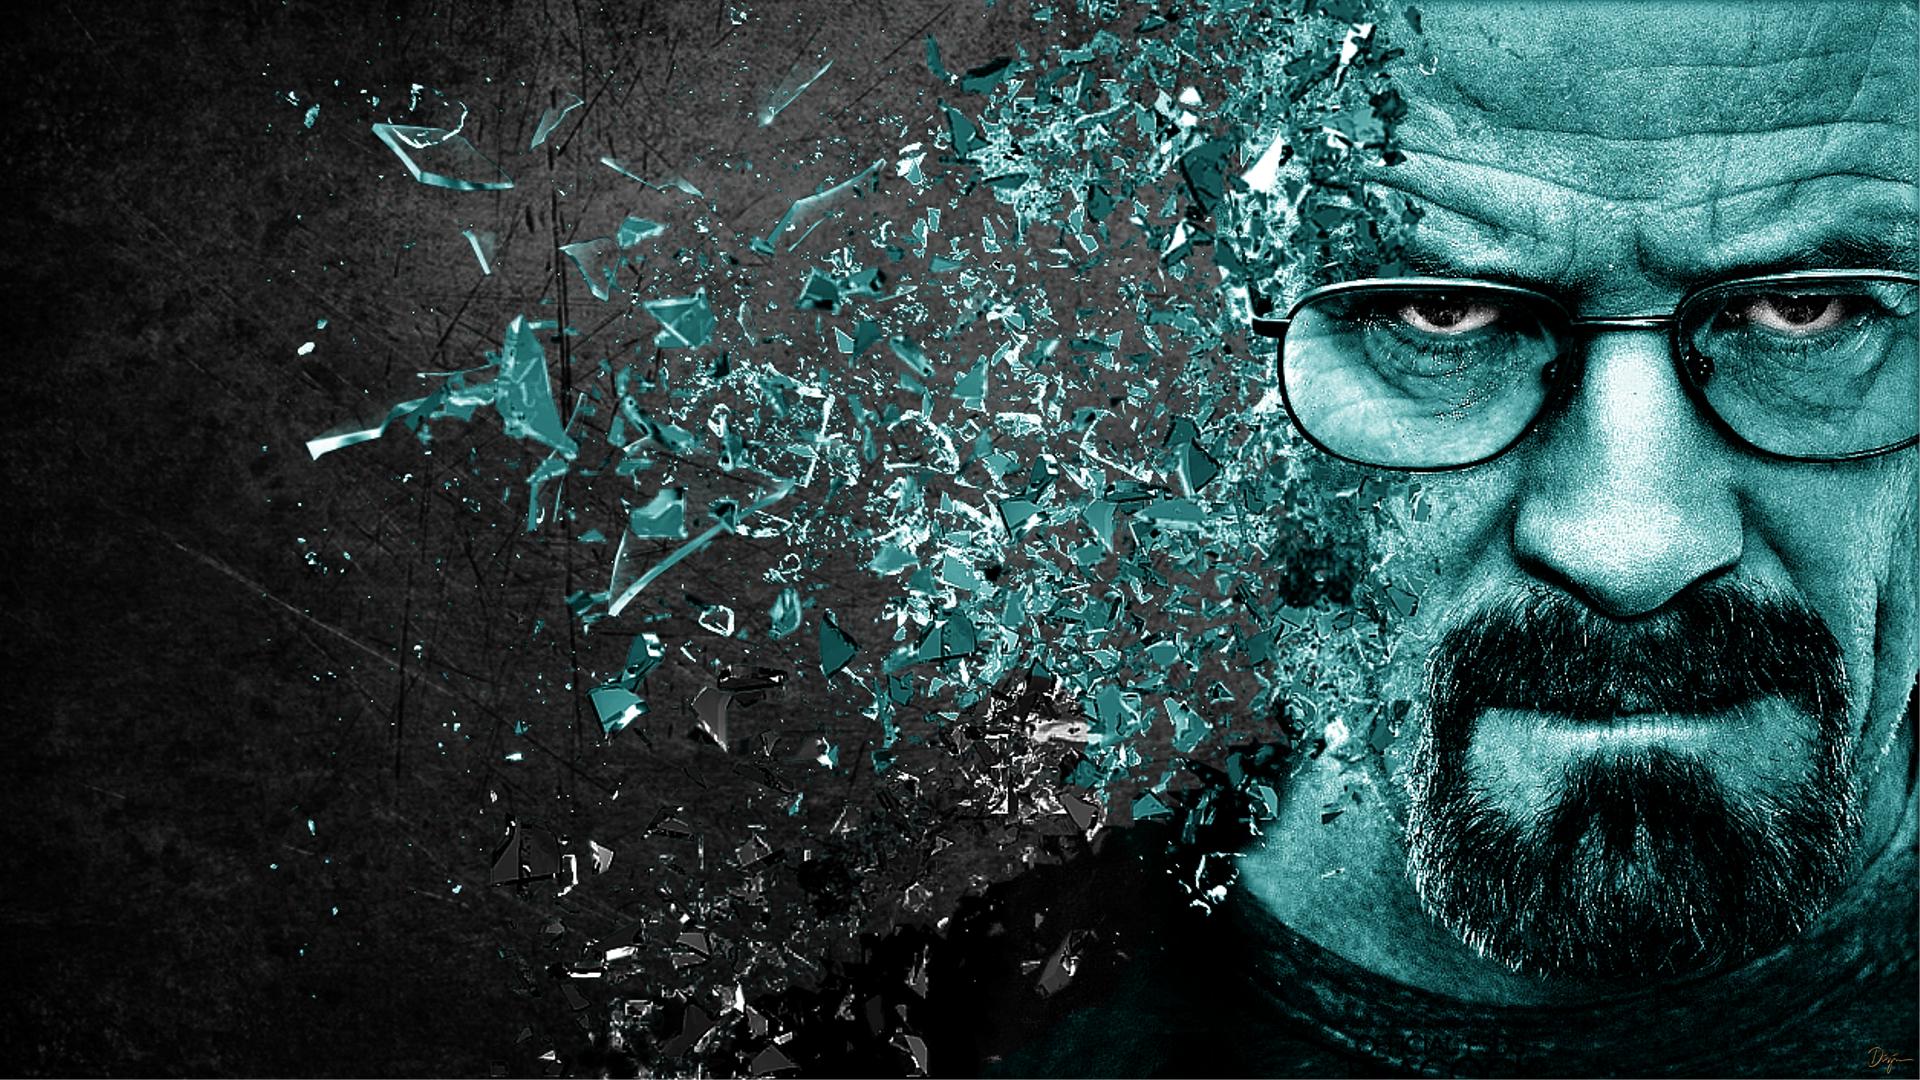 Breaking Bad Wallz by sahinduezguen on DeviantArt